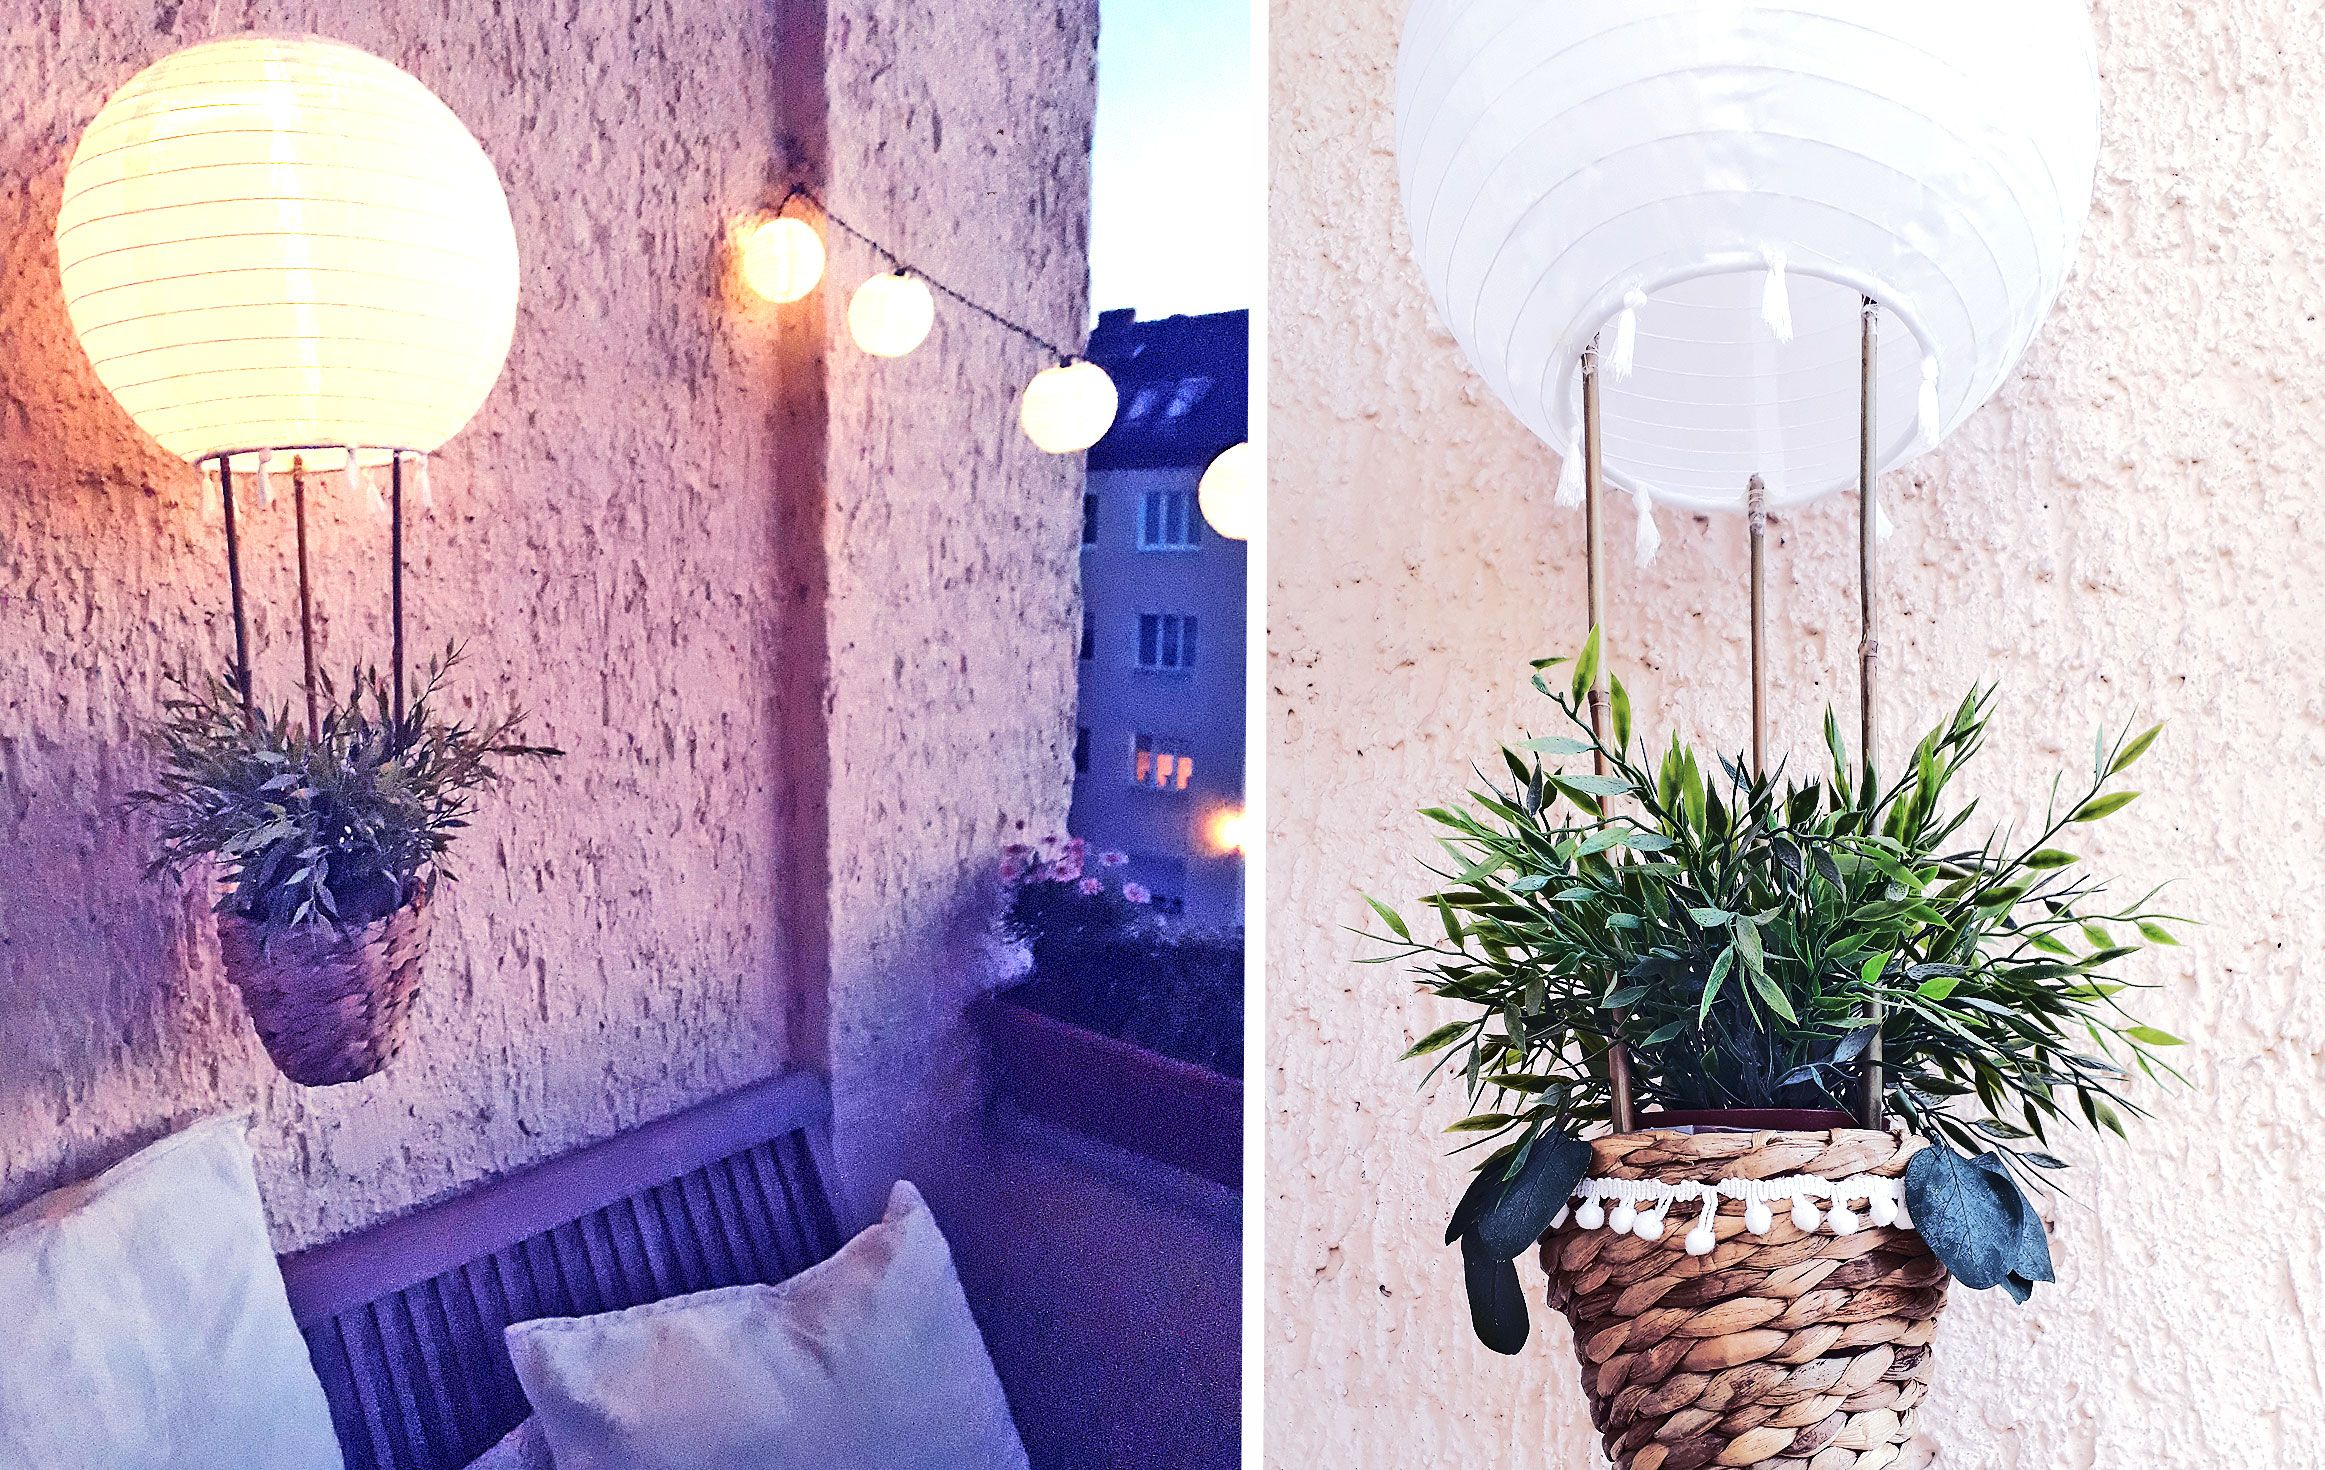 Diy Heissluftballon Solar Lampion Fur Balkon Garten Ikea Hack Aye Aye Diy Heissluftballon Lampions Ikea Lampen